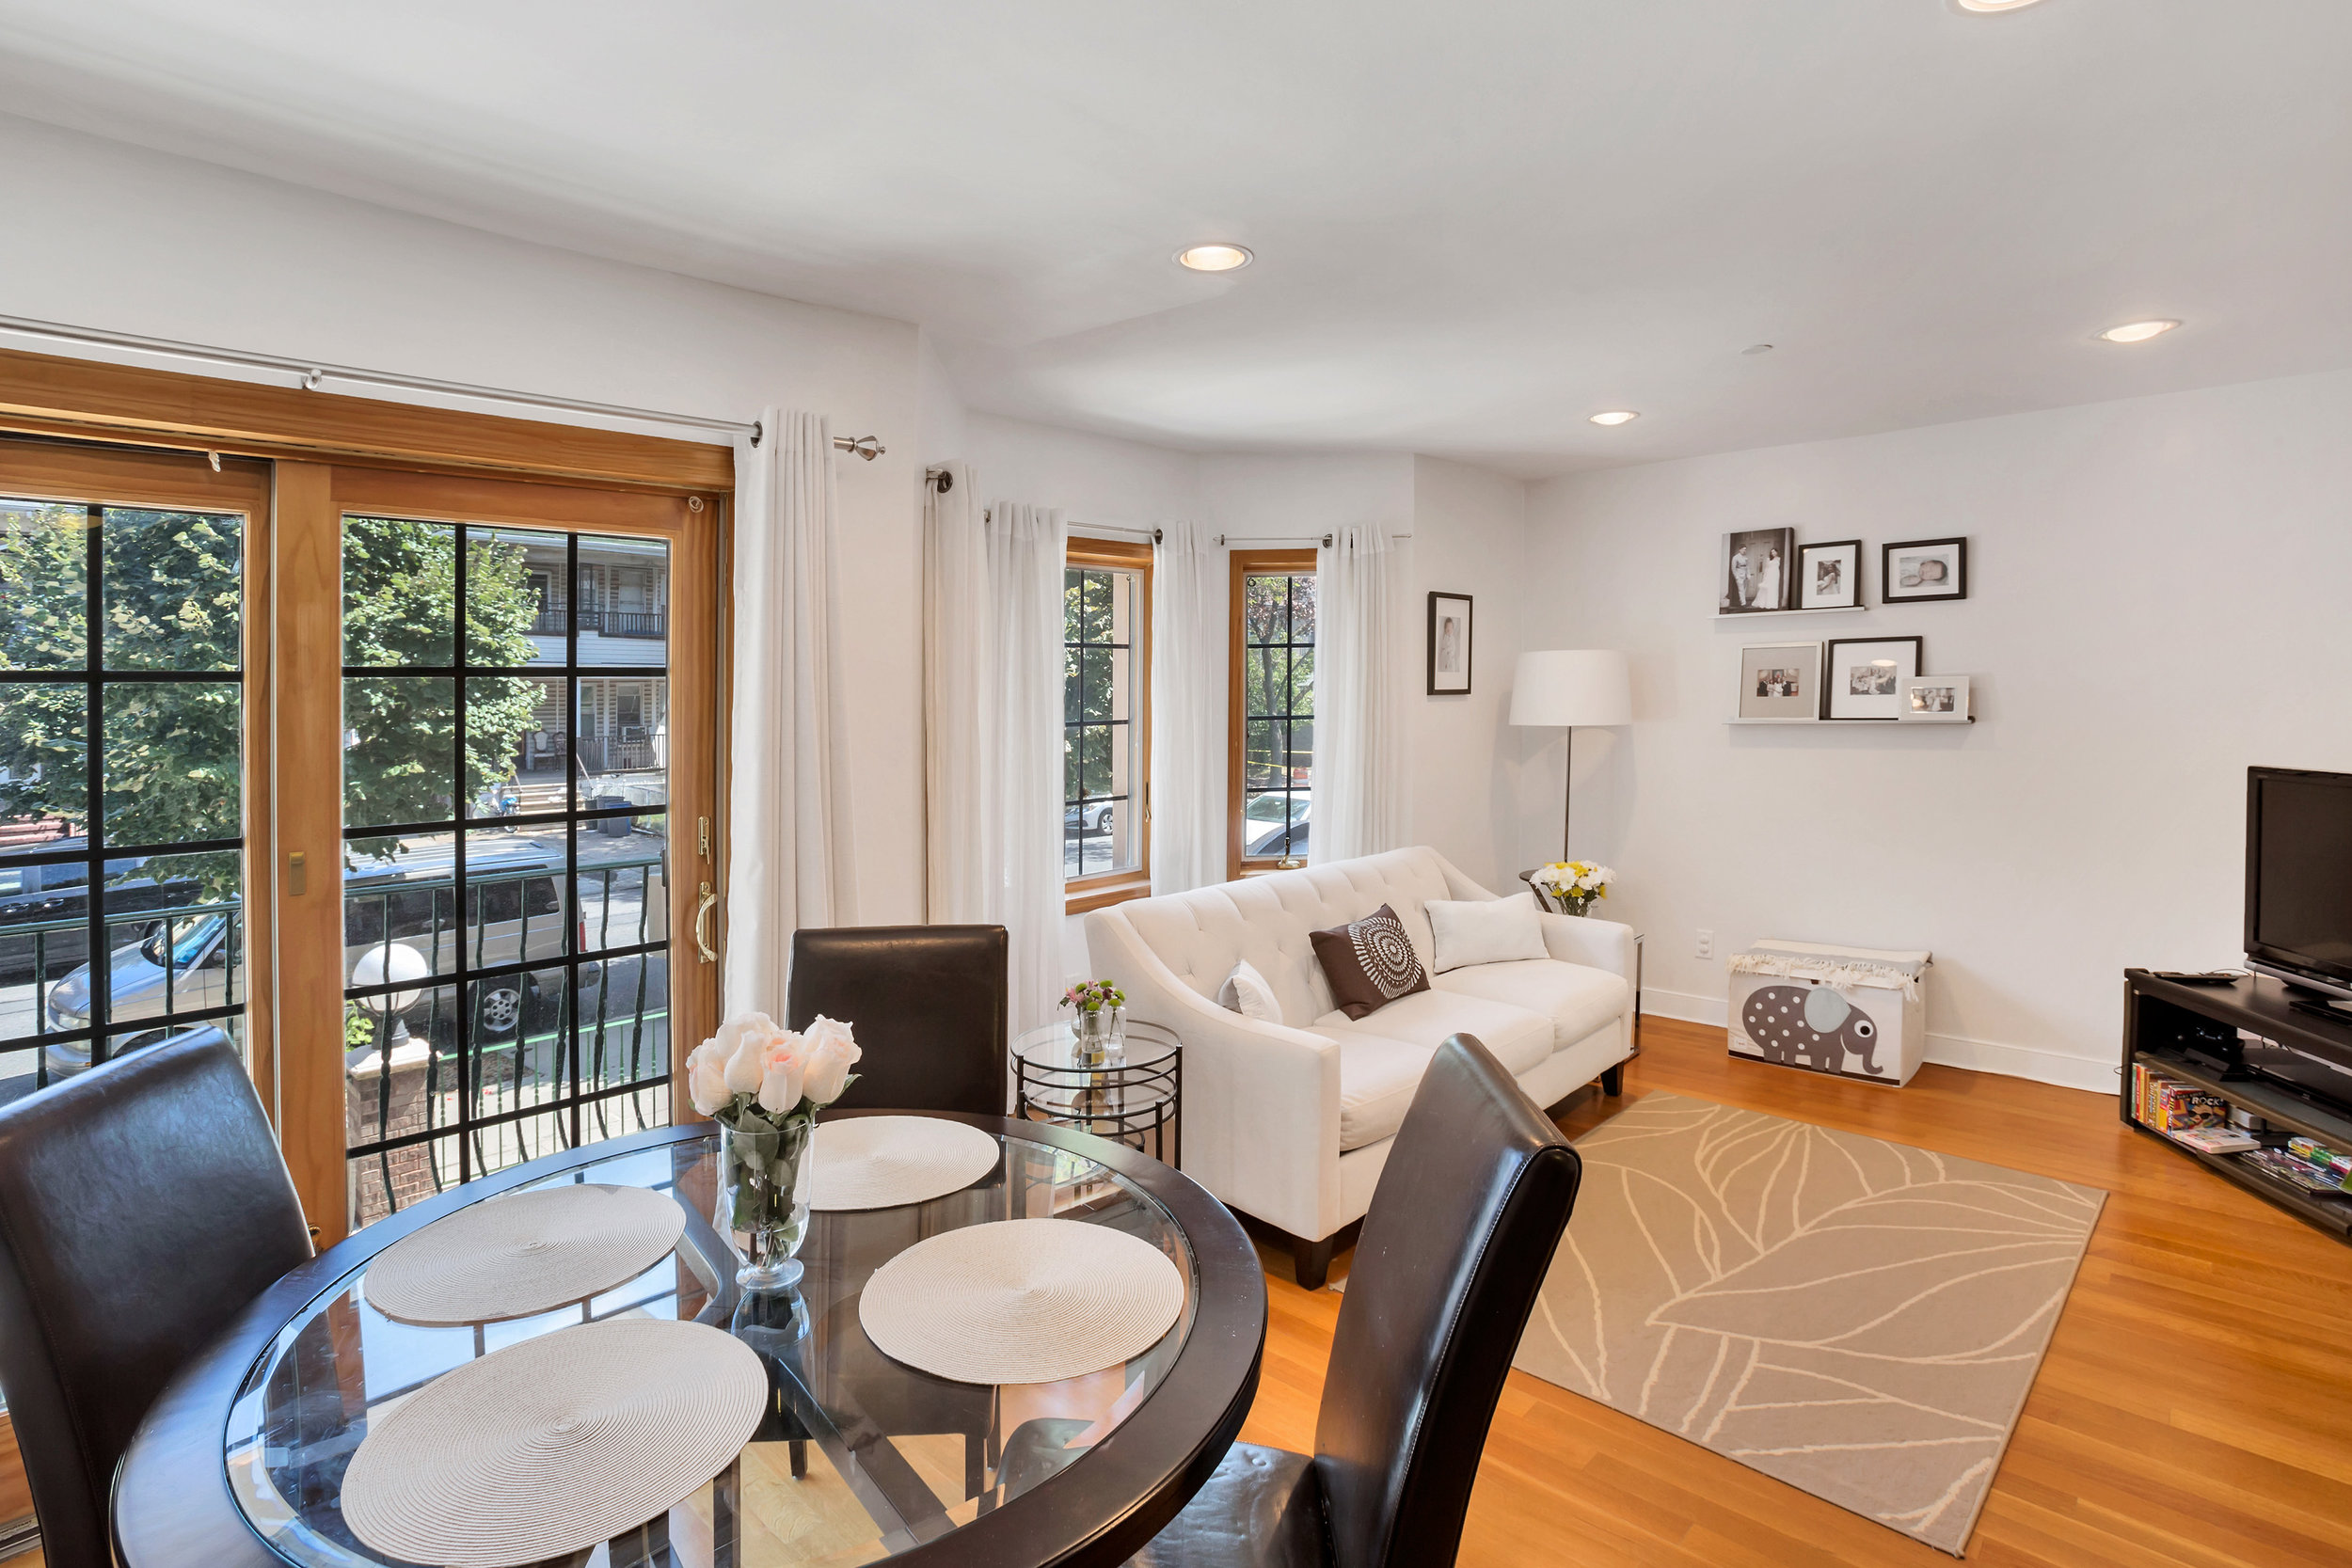 734 East 5th Street, #2R - $775,000